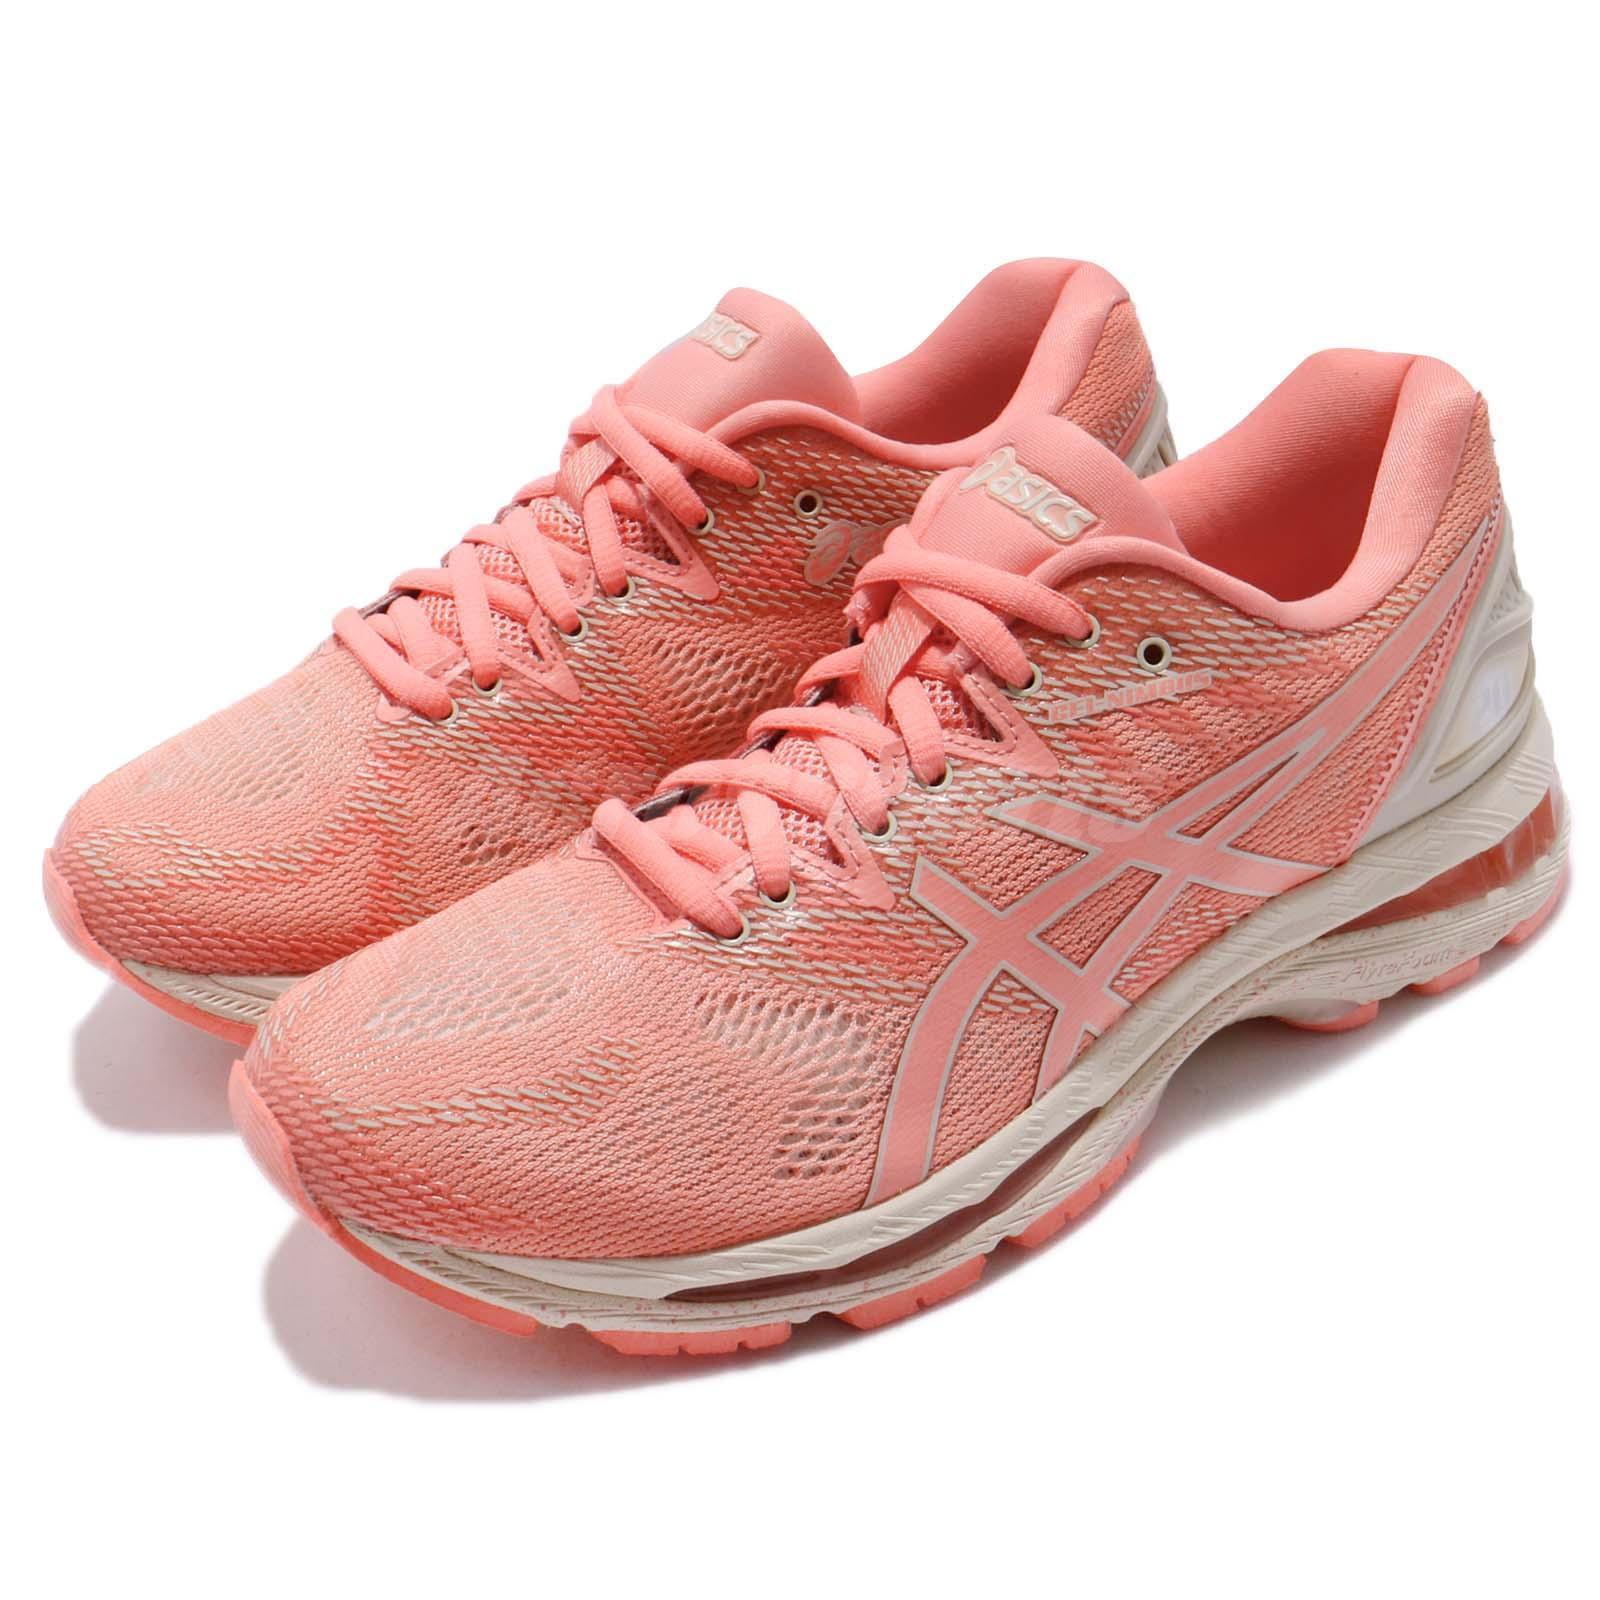 Asics Gel Nimbus 20 SAKURA SP SAKURA 20 Cherry Coffee Rose Femme Running Chaussures c226af